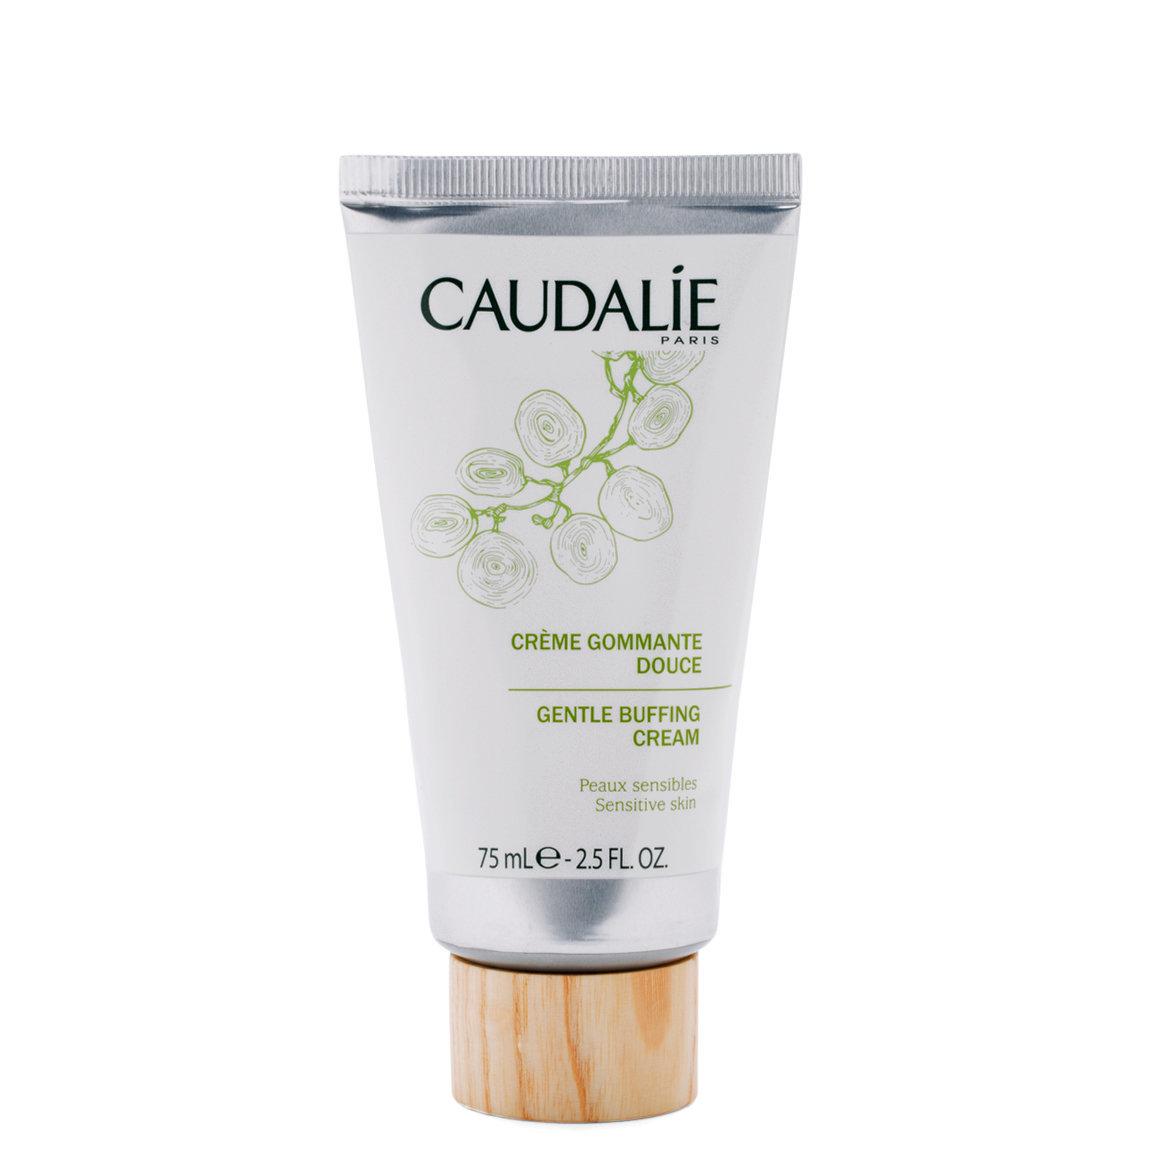 Caudalie Gentle Buffing Cream product swatch.